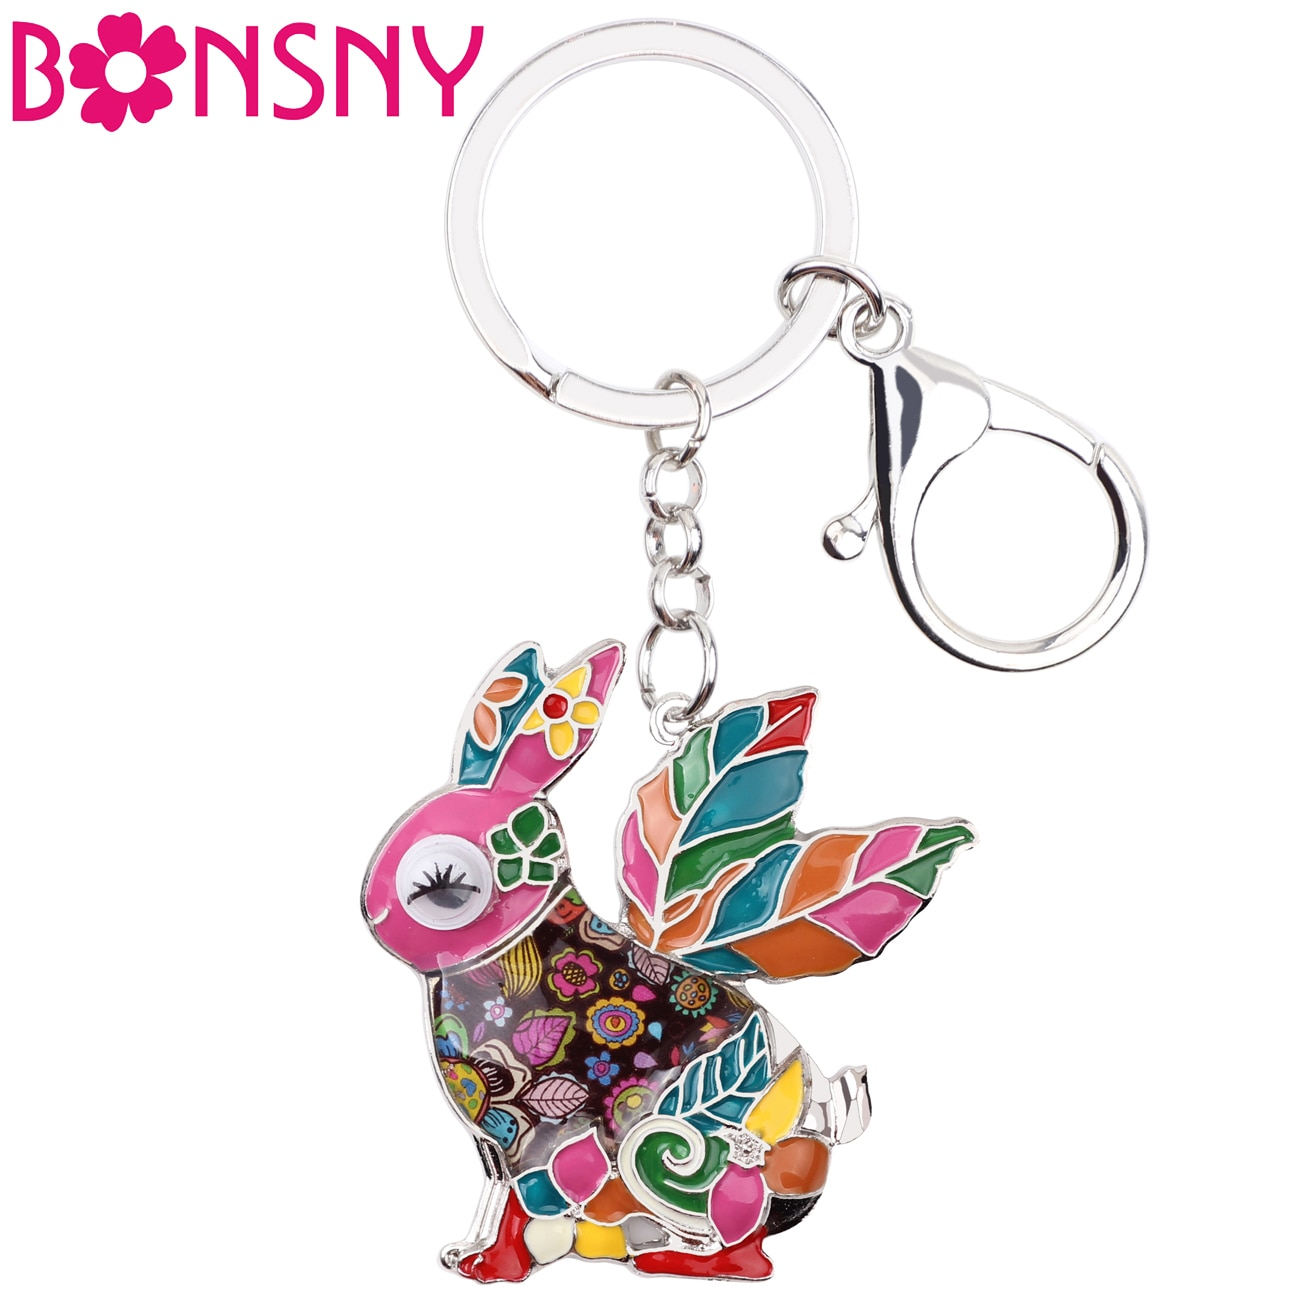 Bonsny Enamel Alloy Rabbit Hare Key Chain Key Ring Handbag Charm New Fashion Animal Jewelry For Women Keychain Accessories